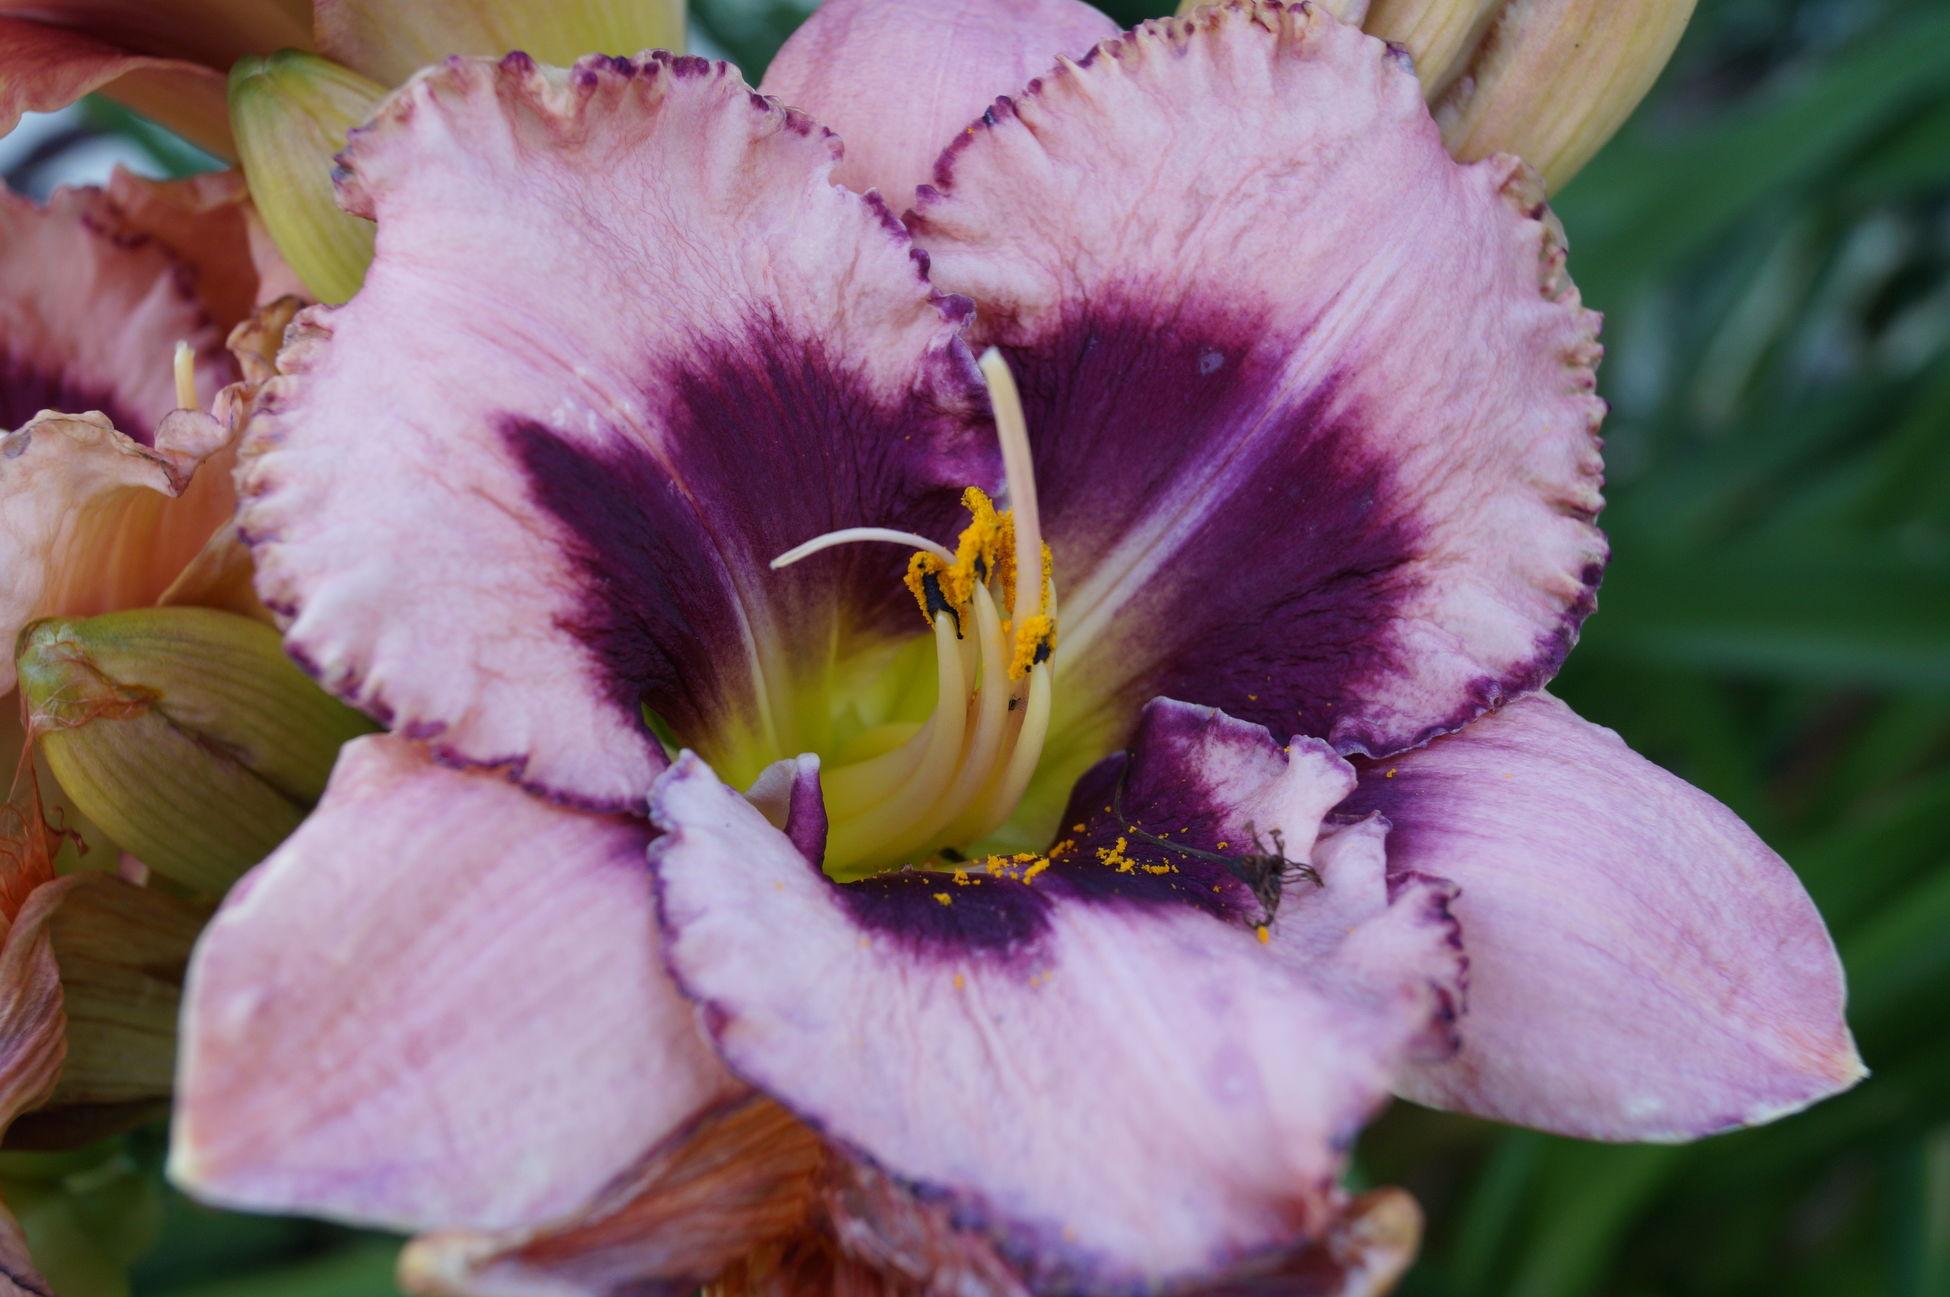 Gartenglück Lilienblüte Sommertime Lieblingsblumen Color Photography Colorphotography Flower Lieblingsblume